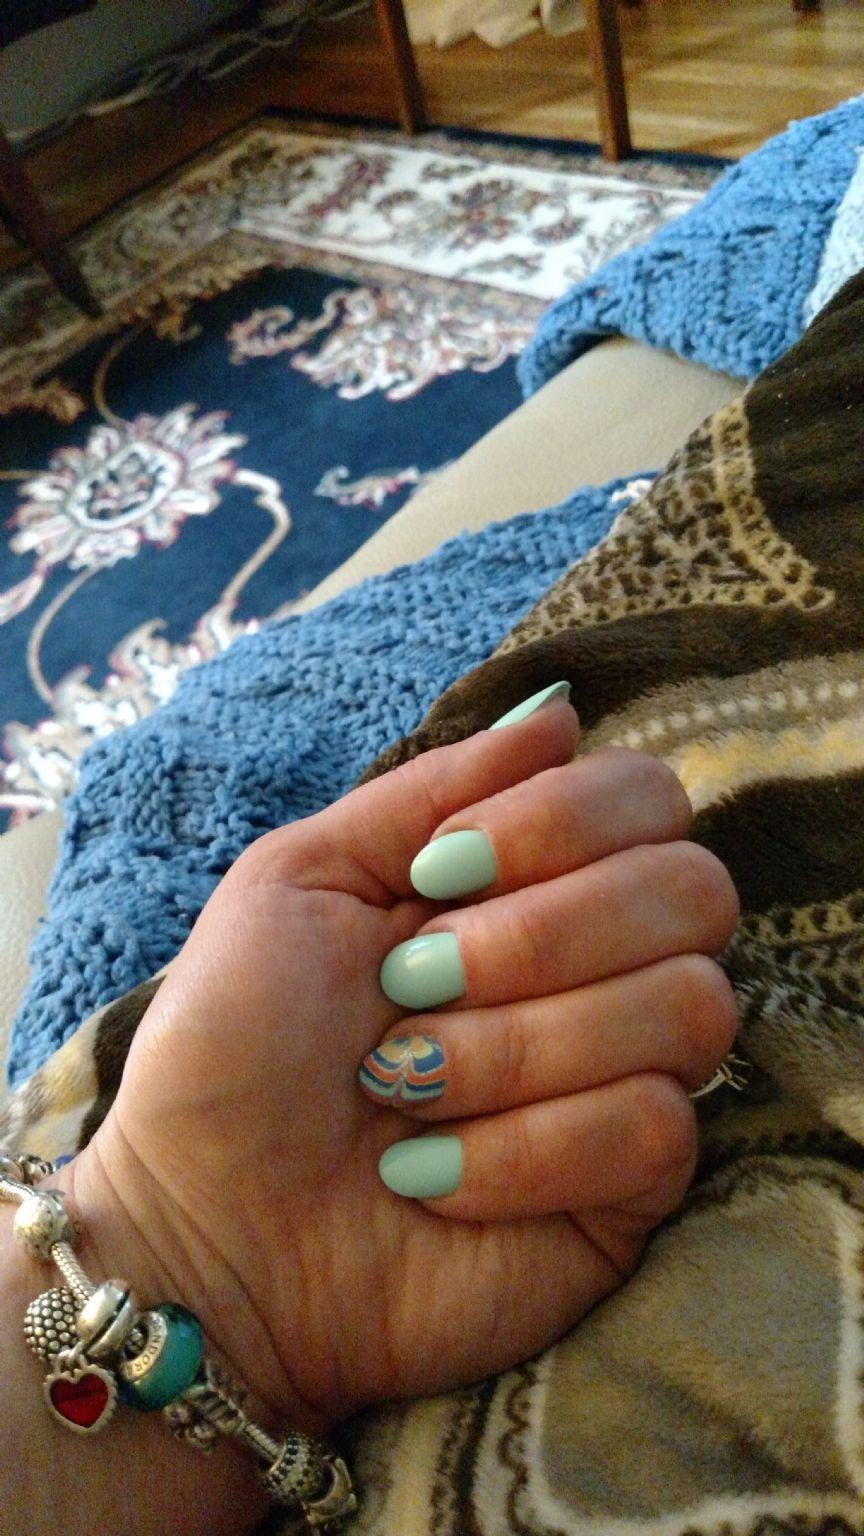 Broadway- imPRESS nails reviews, photos - Makeupalley